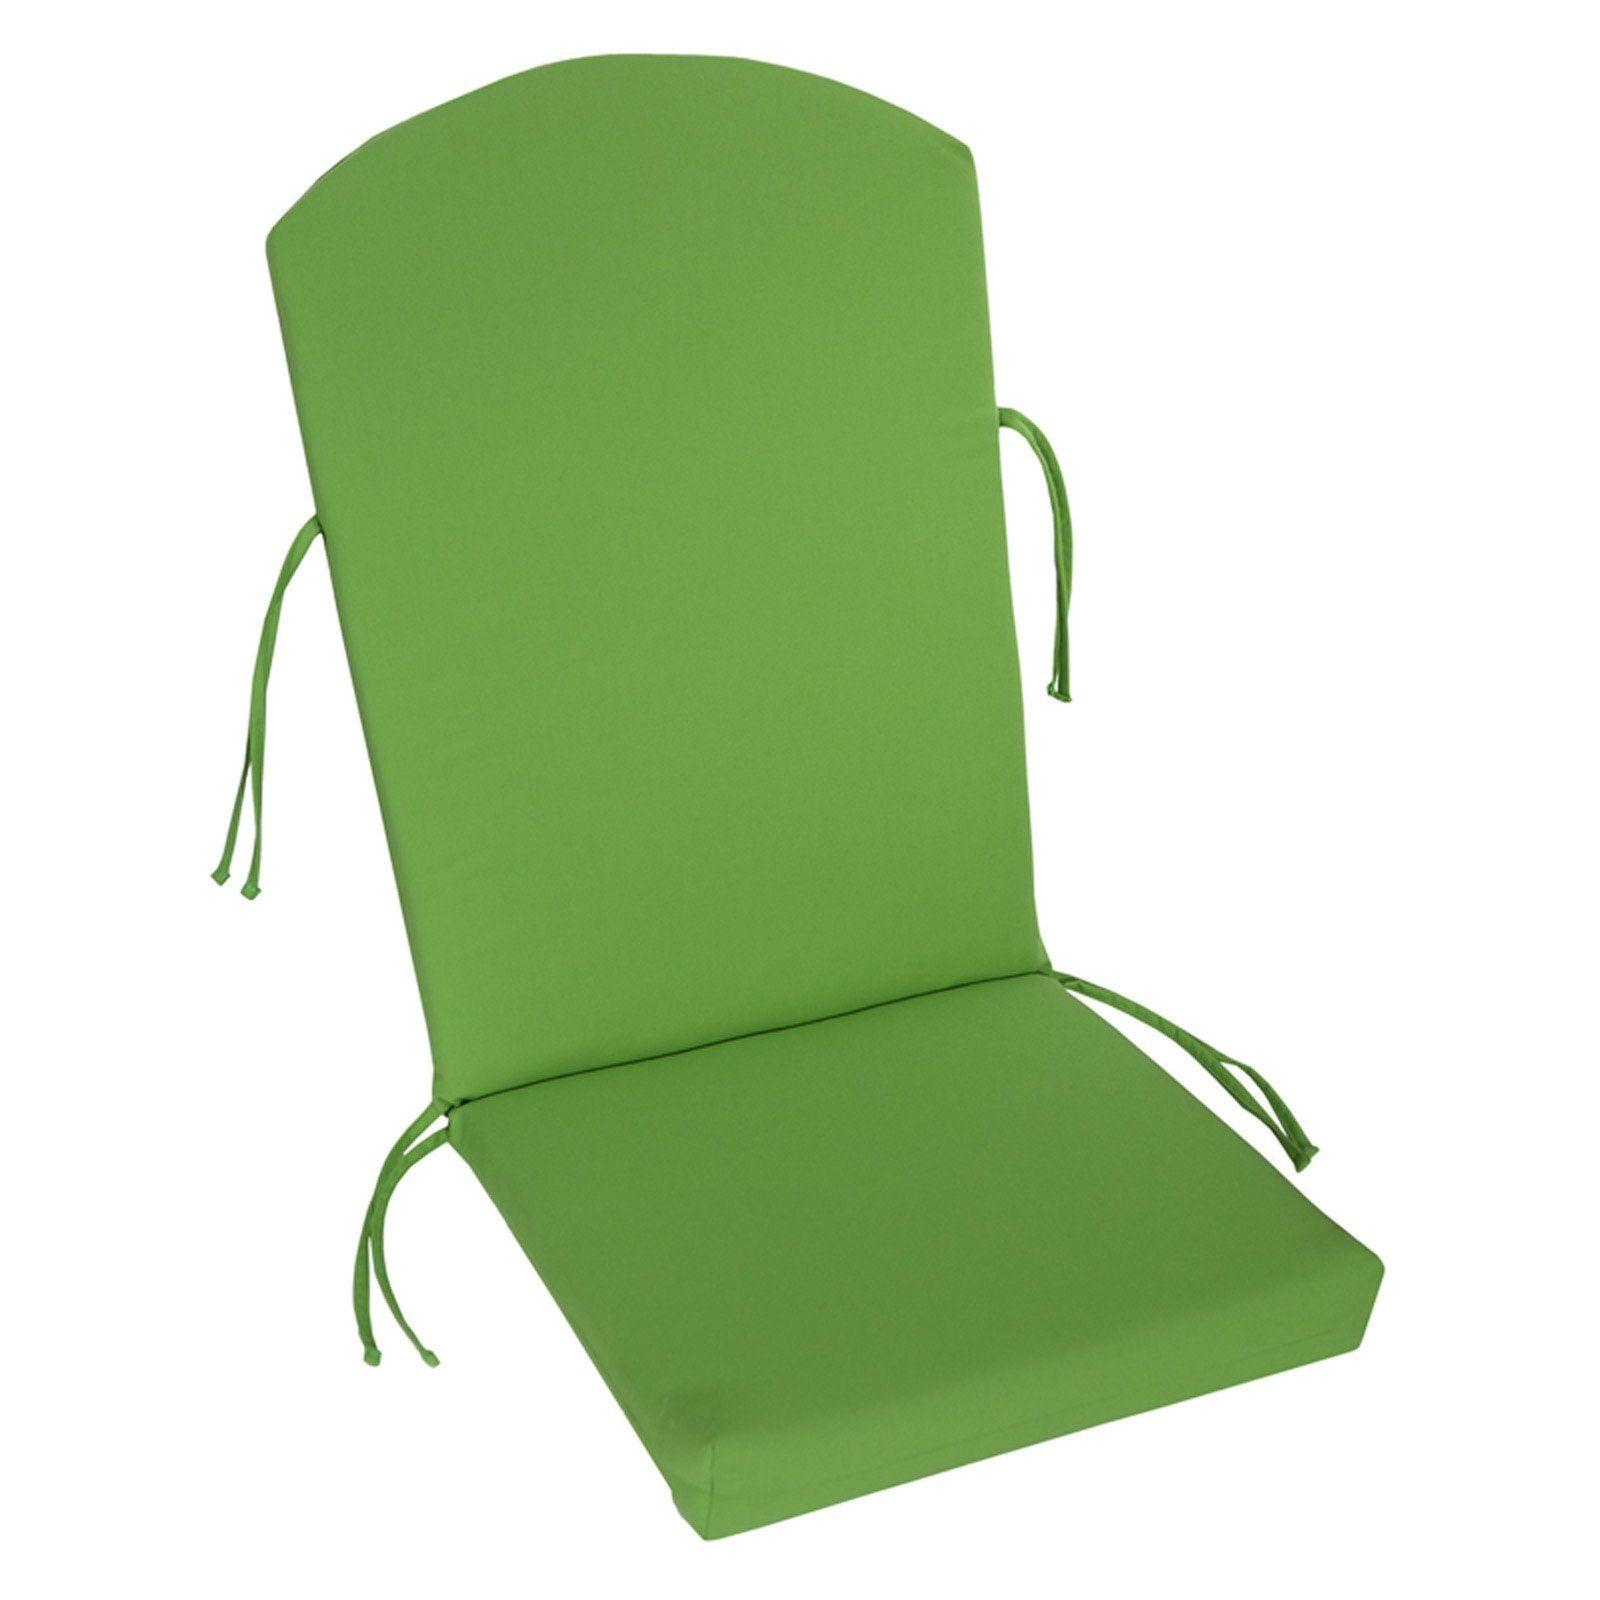 Thomasville At Home Sunbrella Adirondack Chair Cushion